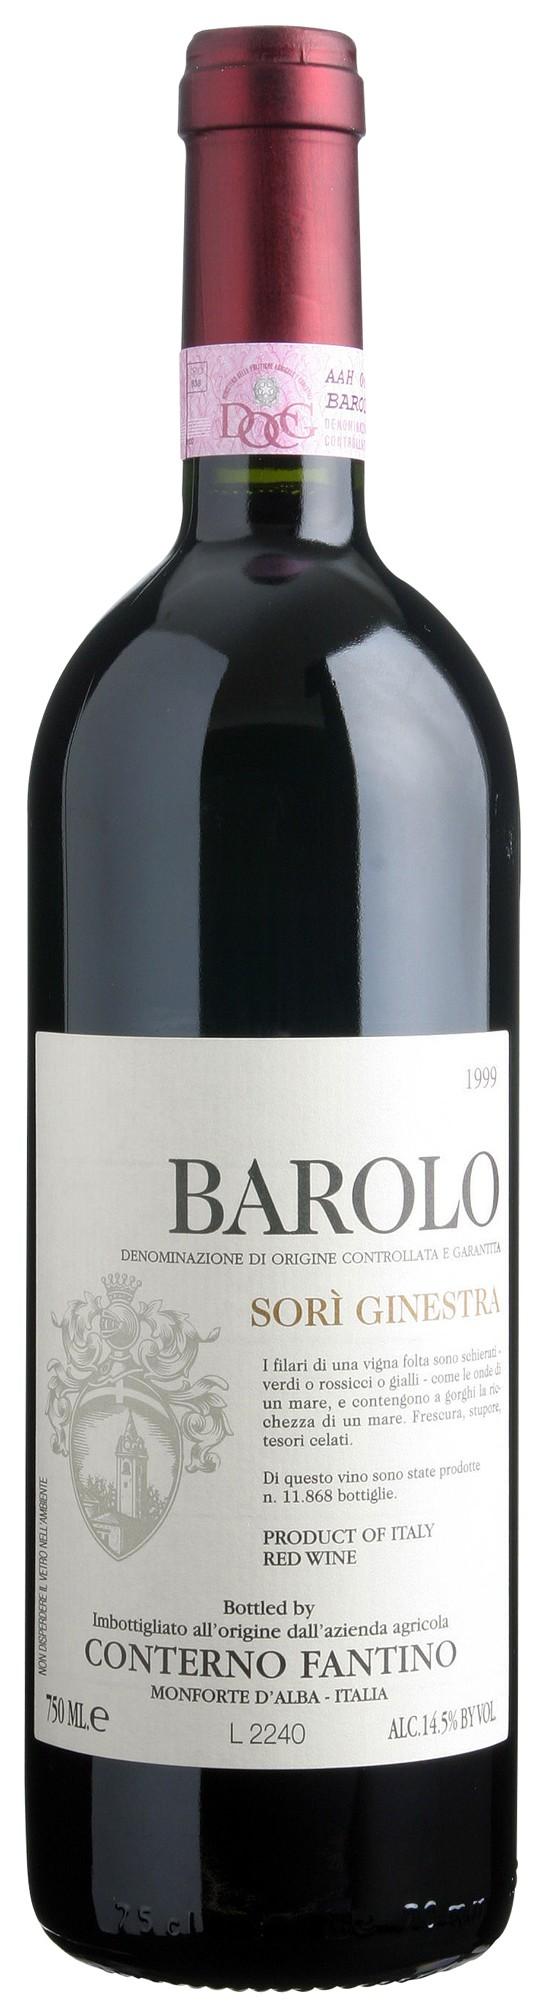 Conterno Fantino - Barolo Sori Ginestra DOCG, 2008